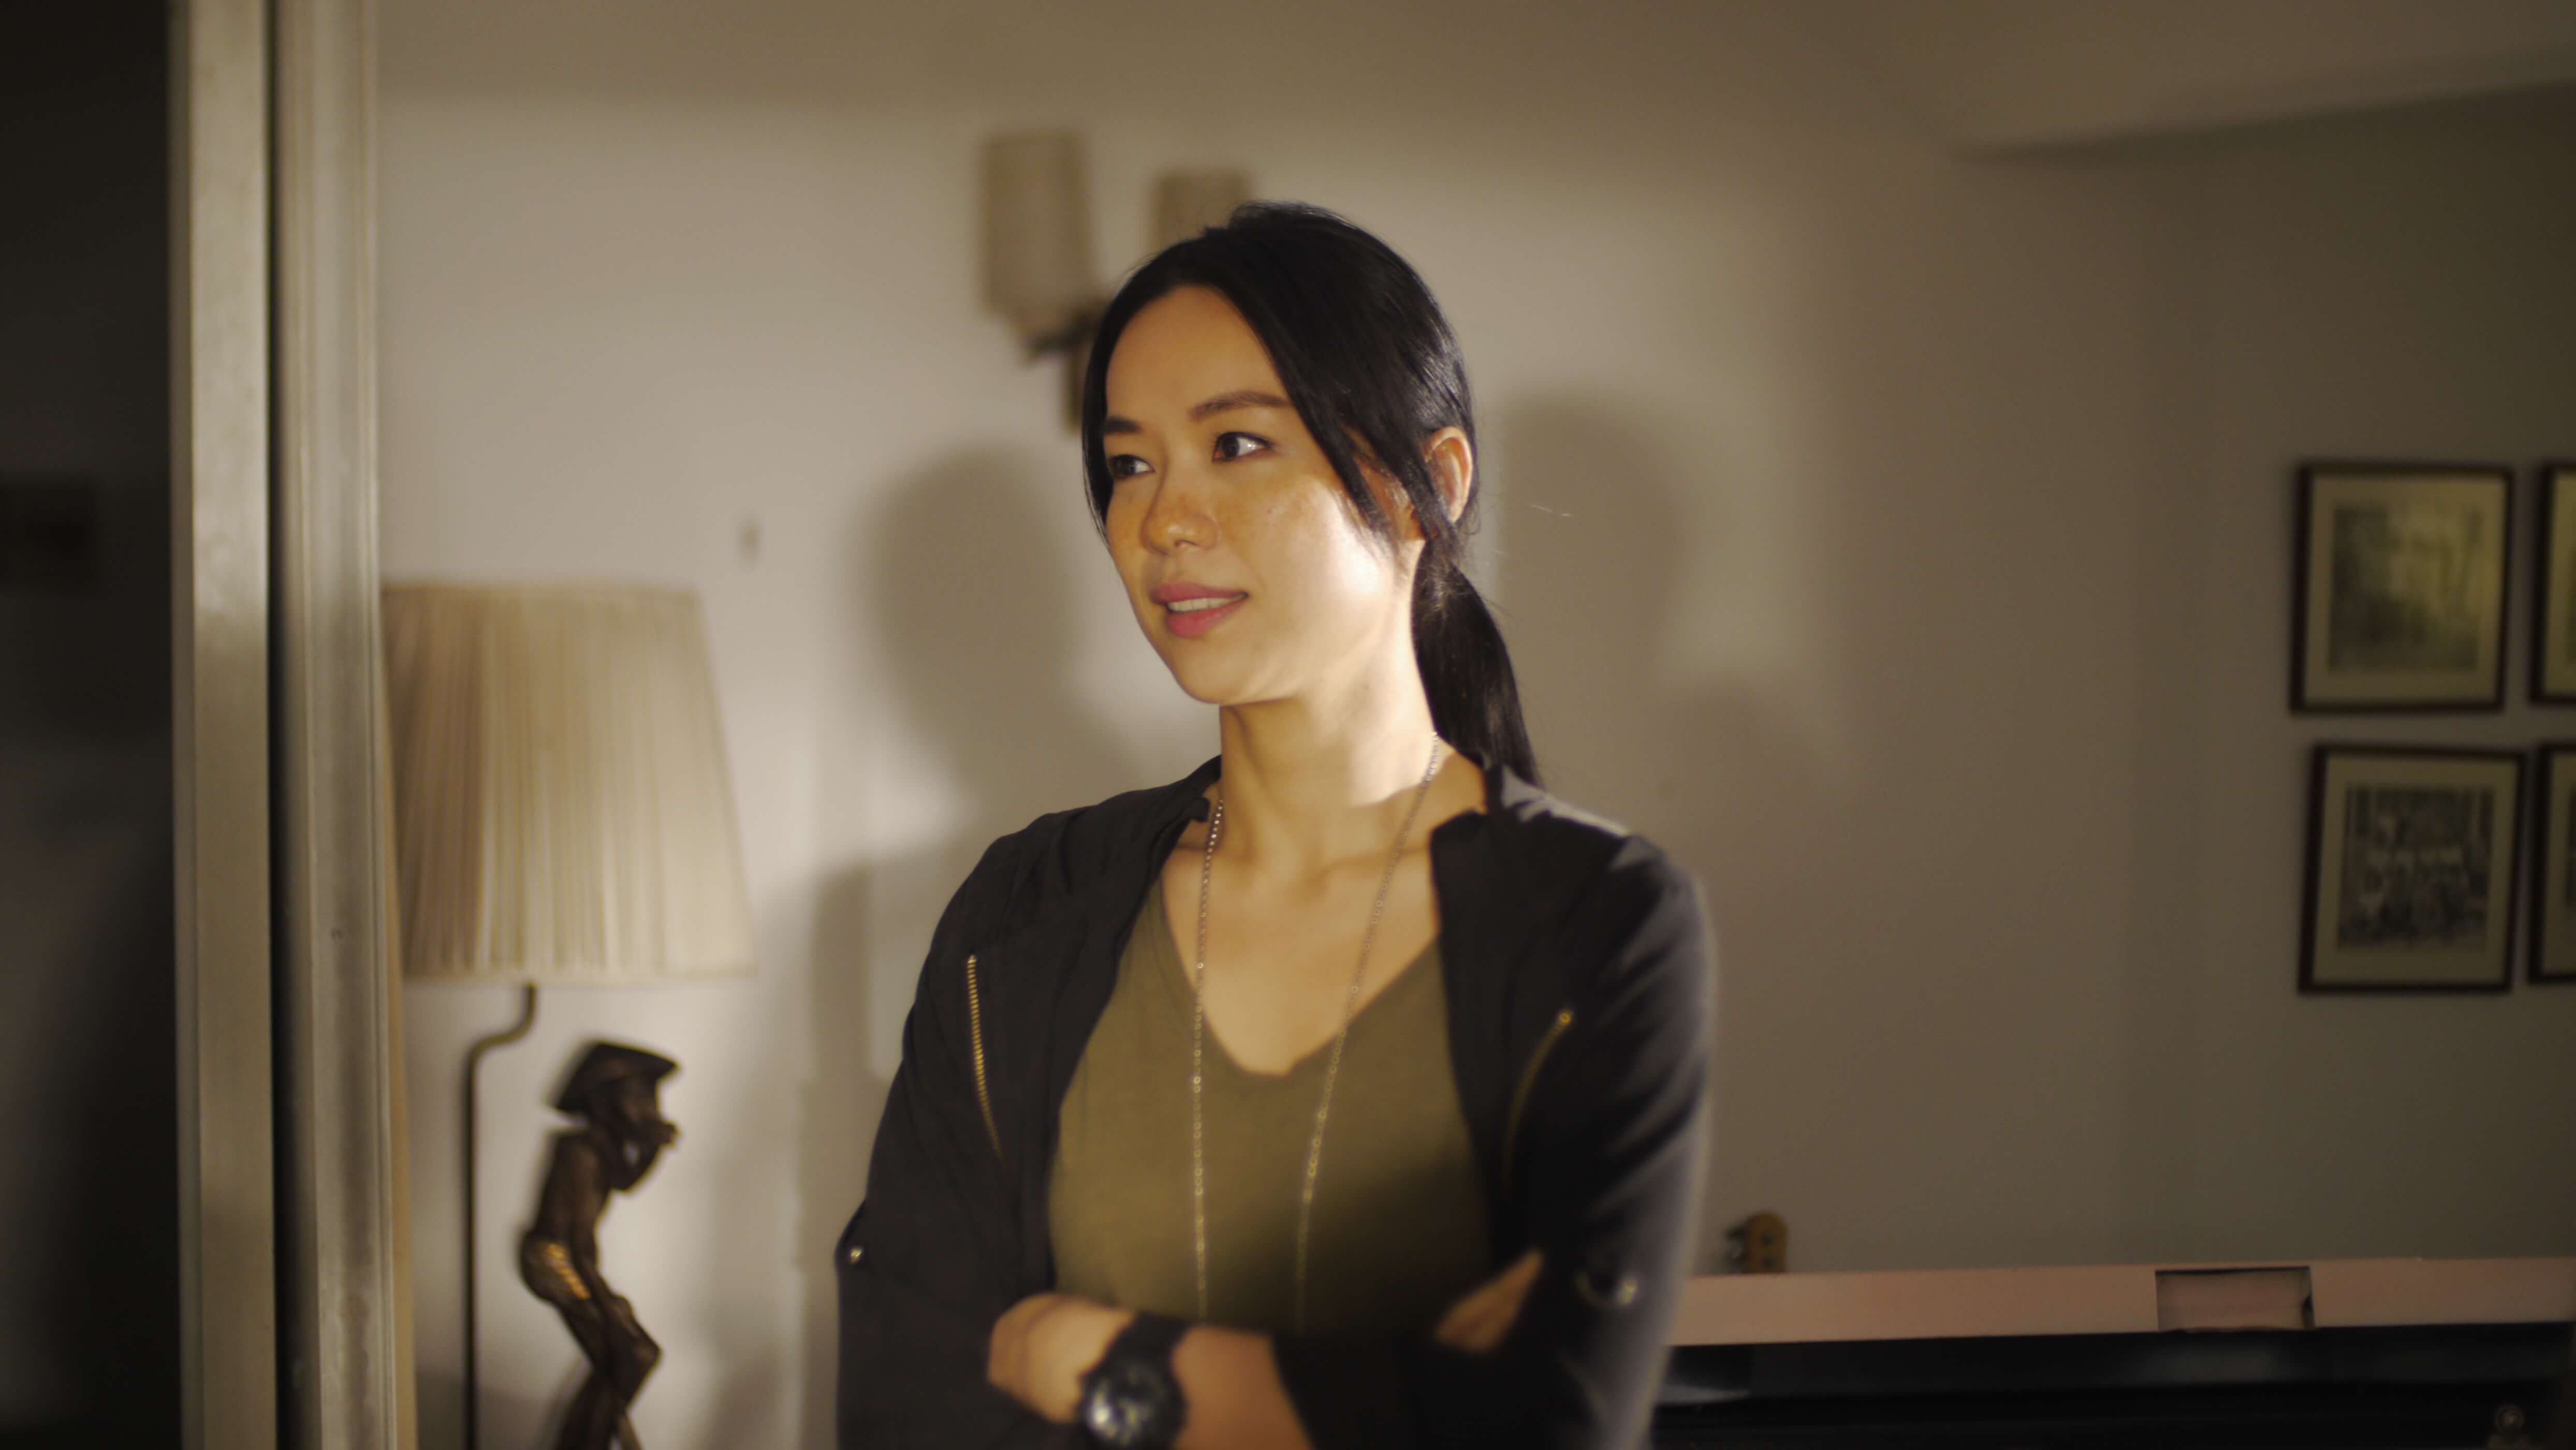 HBO Asia 原創影集《邊界線》劇照。